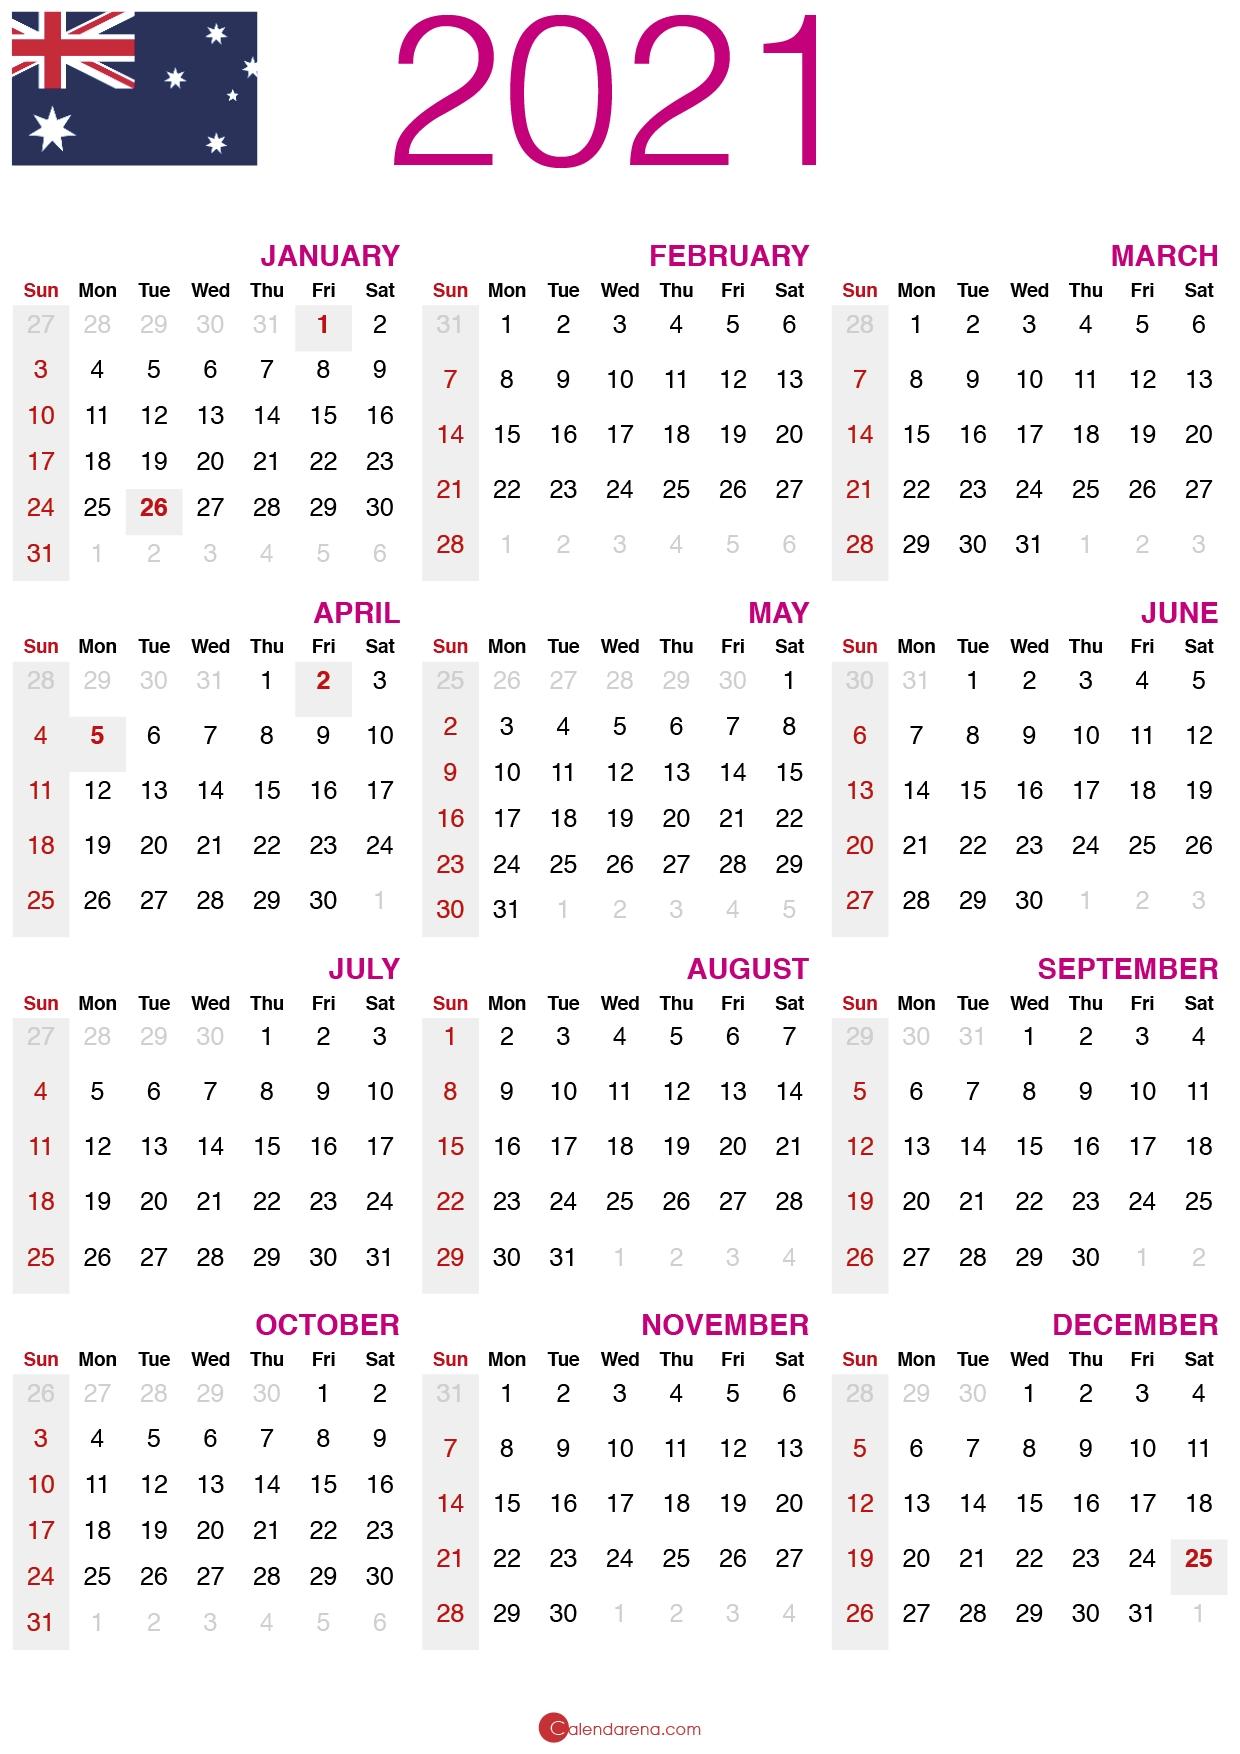 🇦🇺 Download Free 2021 Calendar Australia 🇦🇺